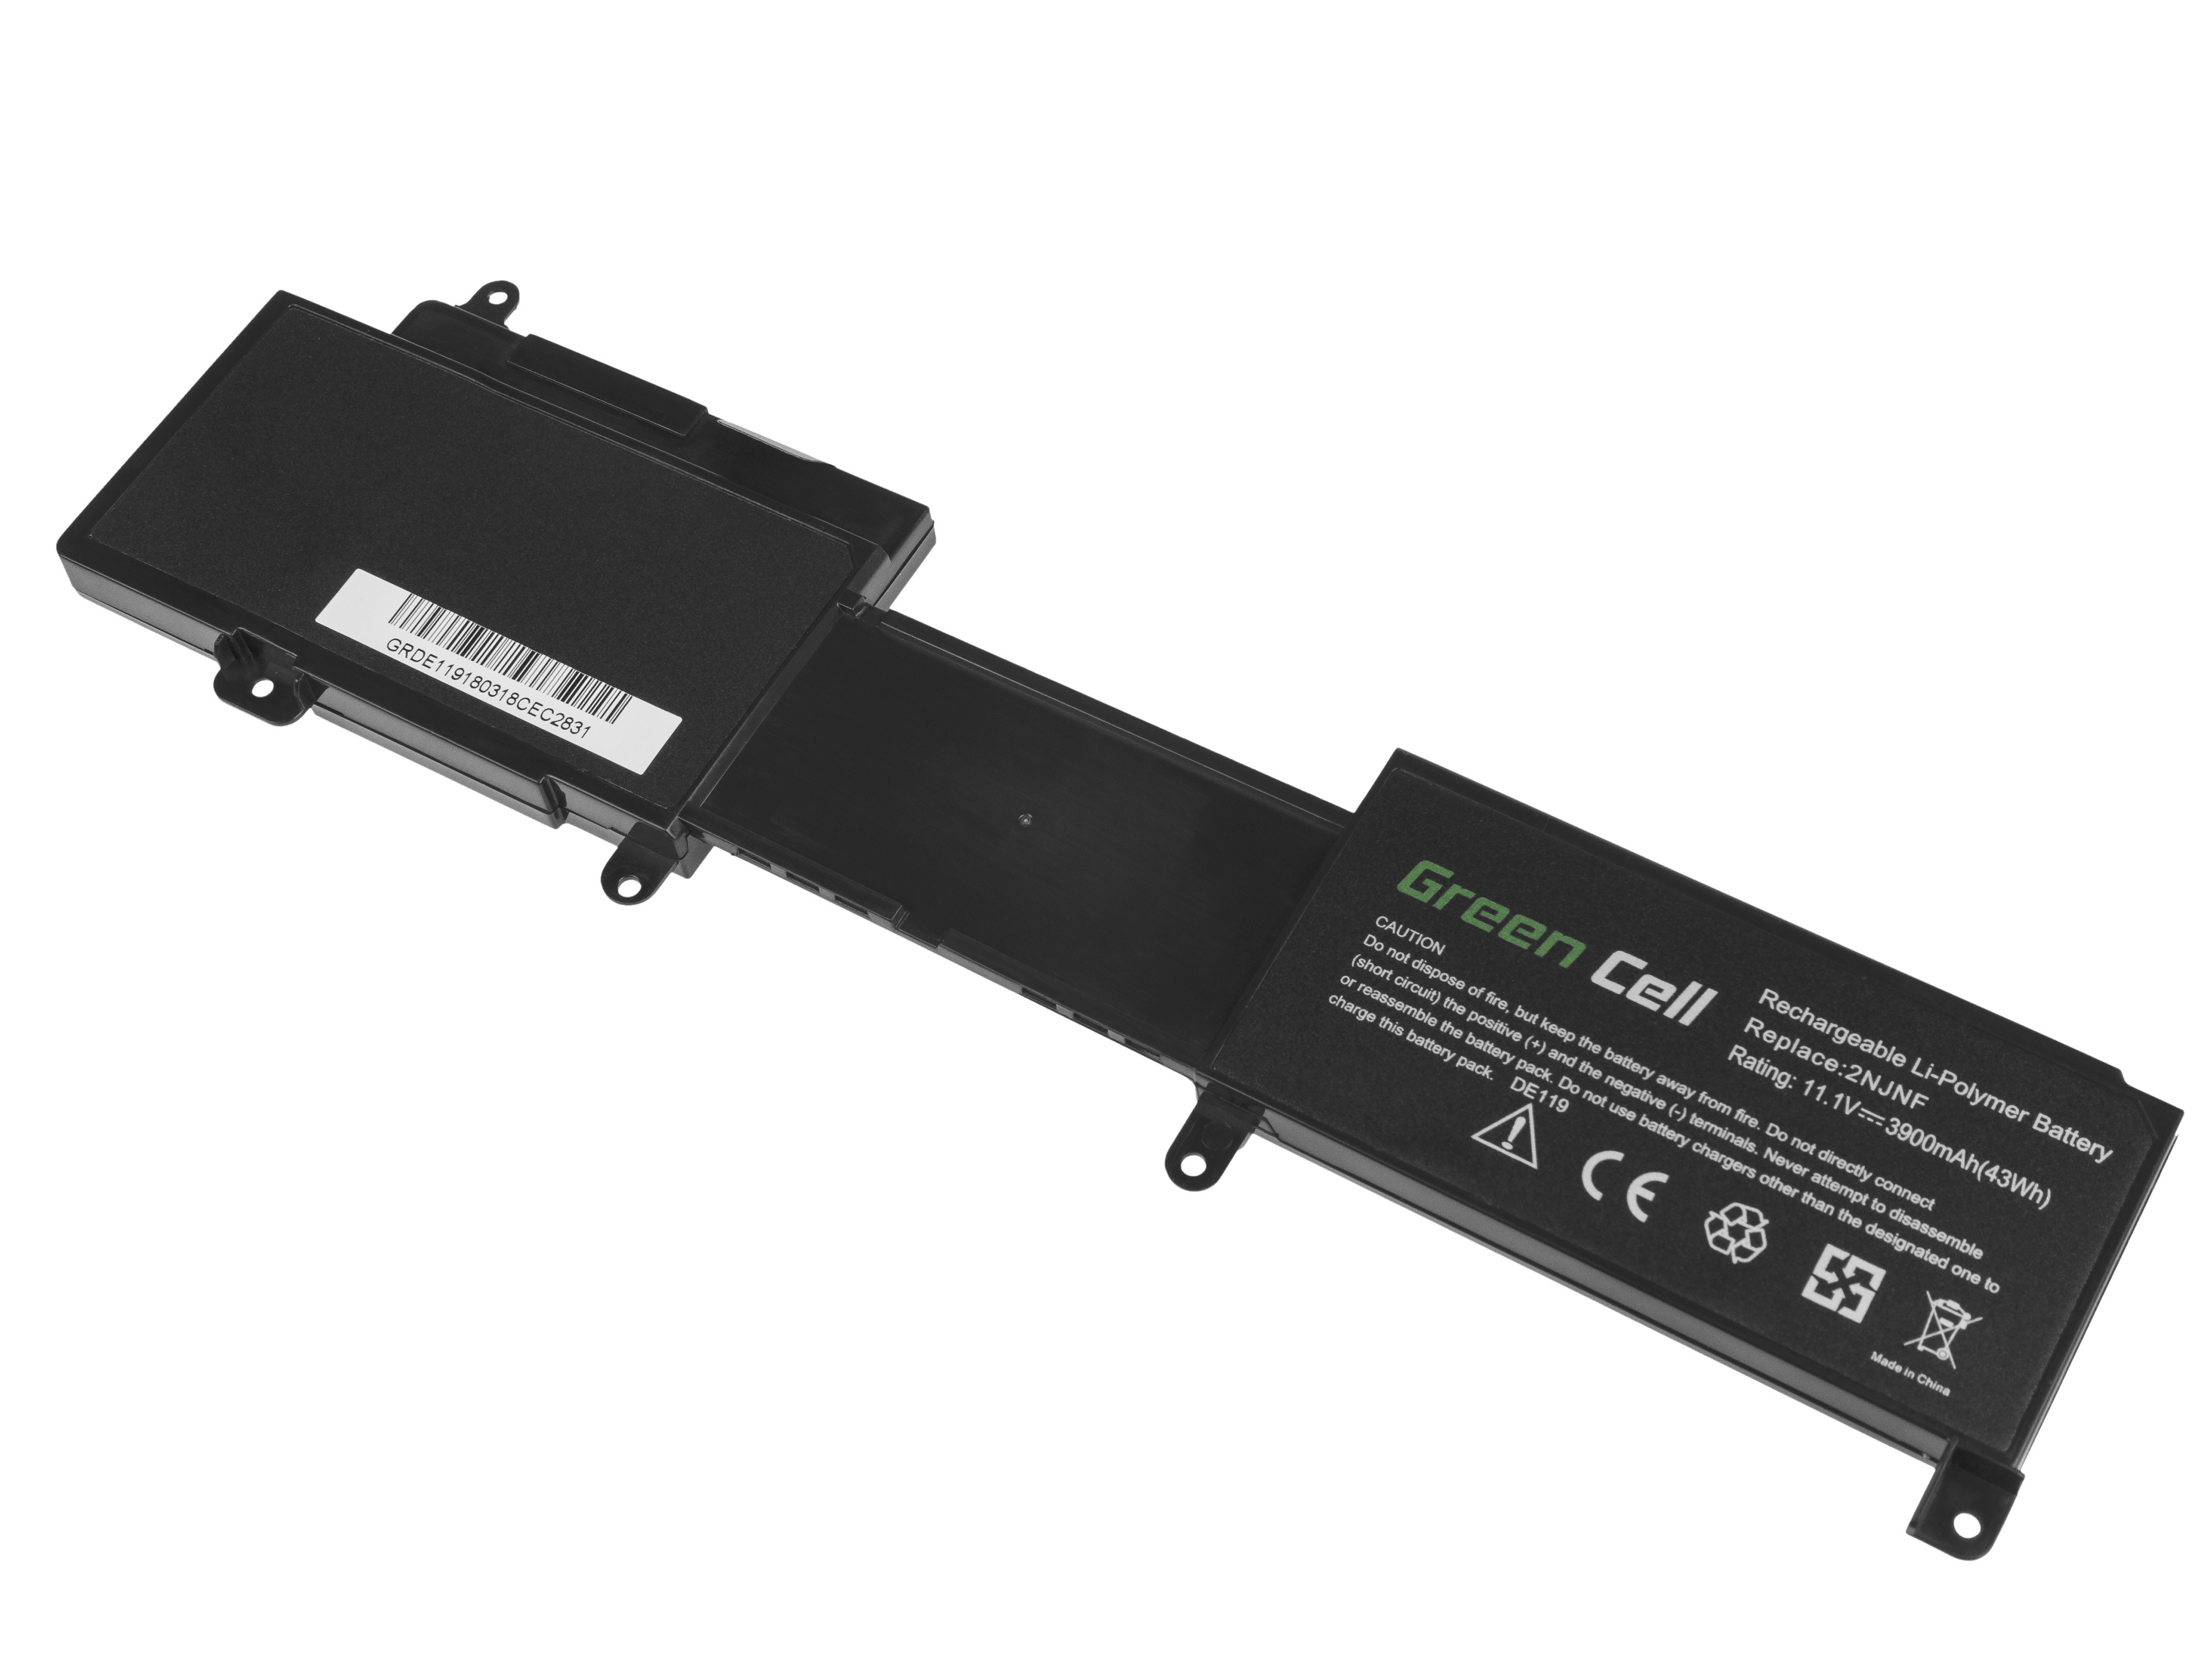 Green Cell DE119 Baterie Dell 2NJNF/8JVDG/BLA010885/BLA010886/T41M0/TPMCF/Dell Inspiron 14z/5423/15z/5523/2NJNF 11,1V 3900mAh Li-Pol – neoriginální